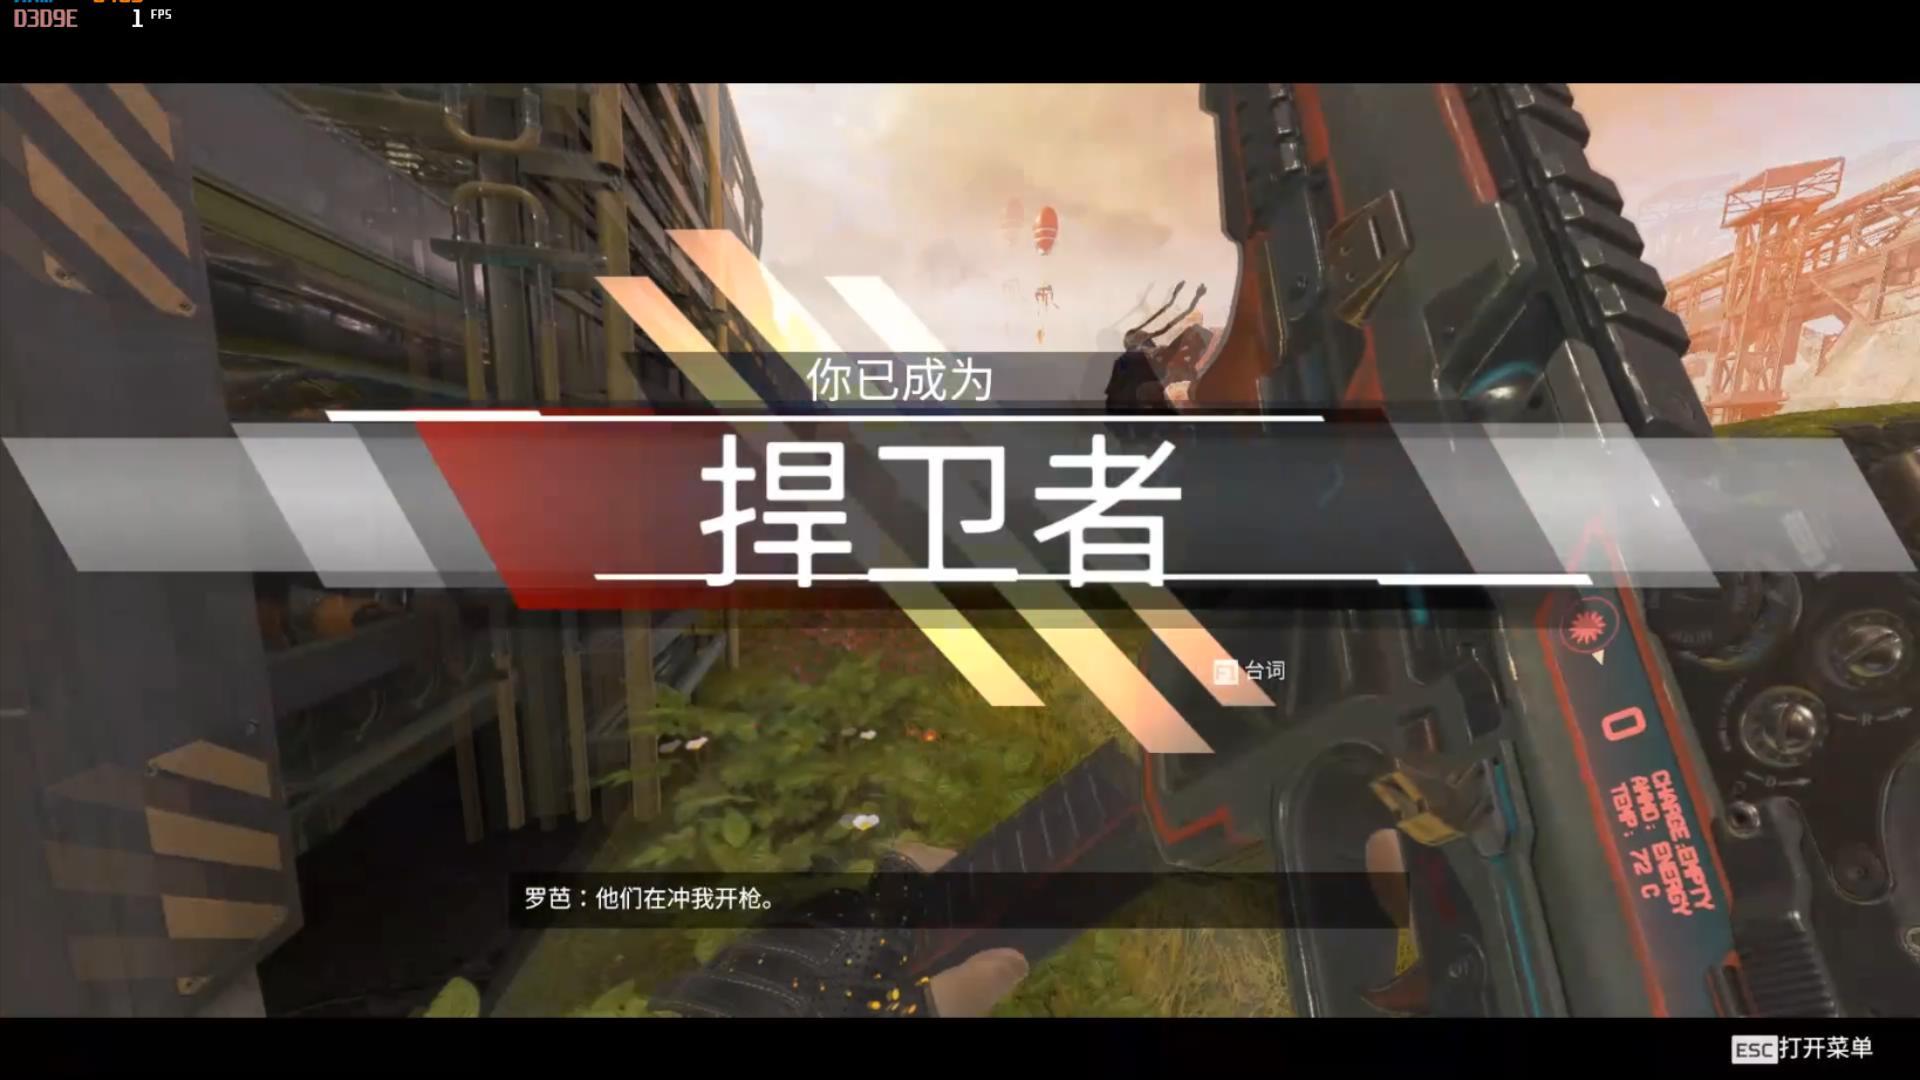 【APEX】献给自己和所有喜欢APEX还在坚持的玩家们-个人战斗混剪